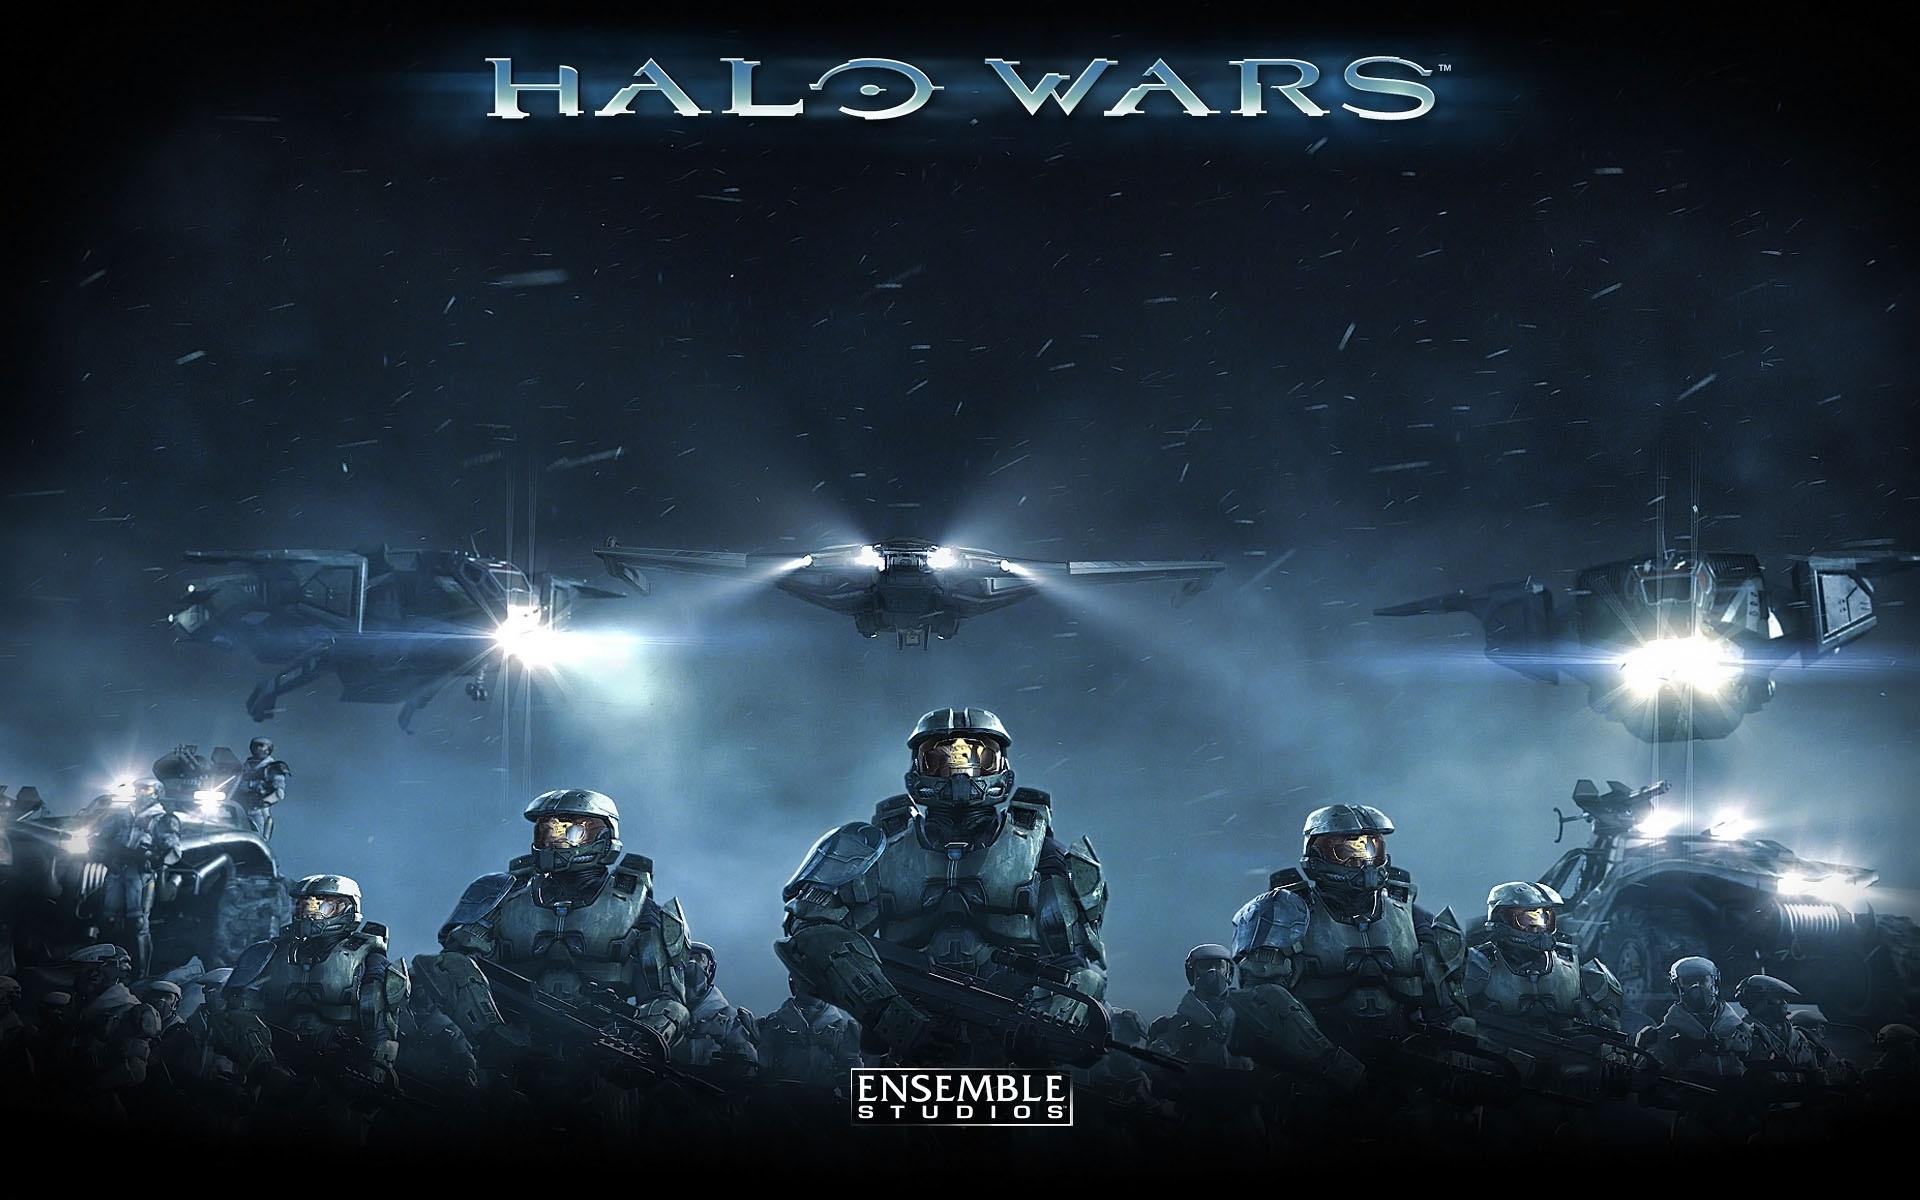 Halo wars hd wallpaper background image 1920x1200 id 274211 wallpaper abyss - Wallpaper halo wars ...